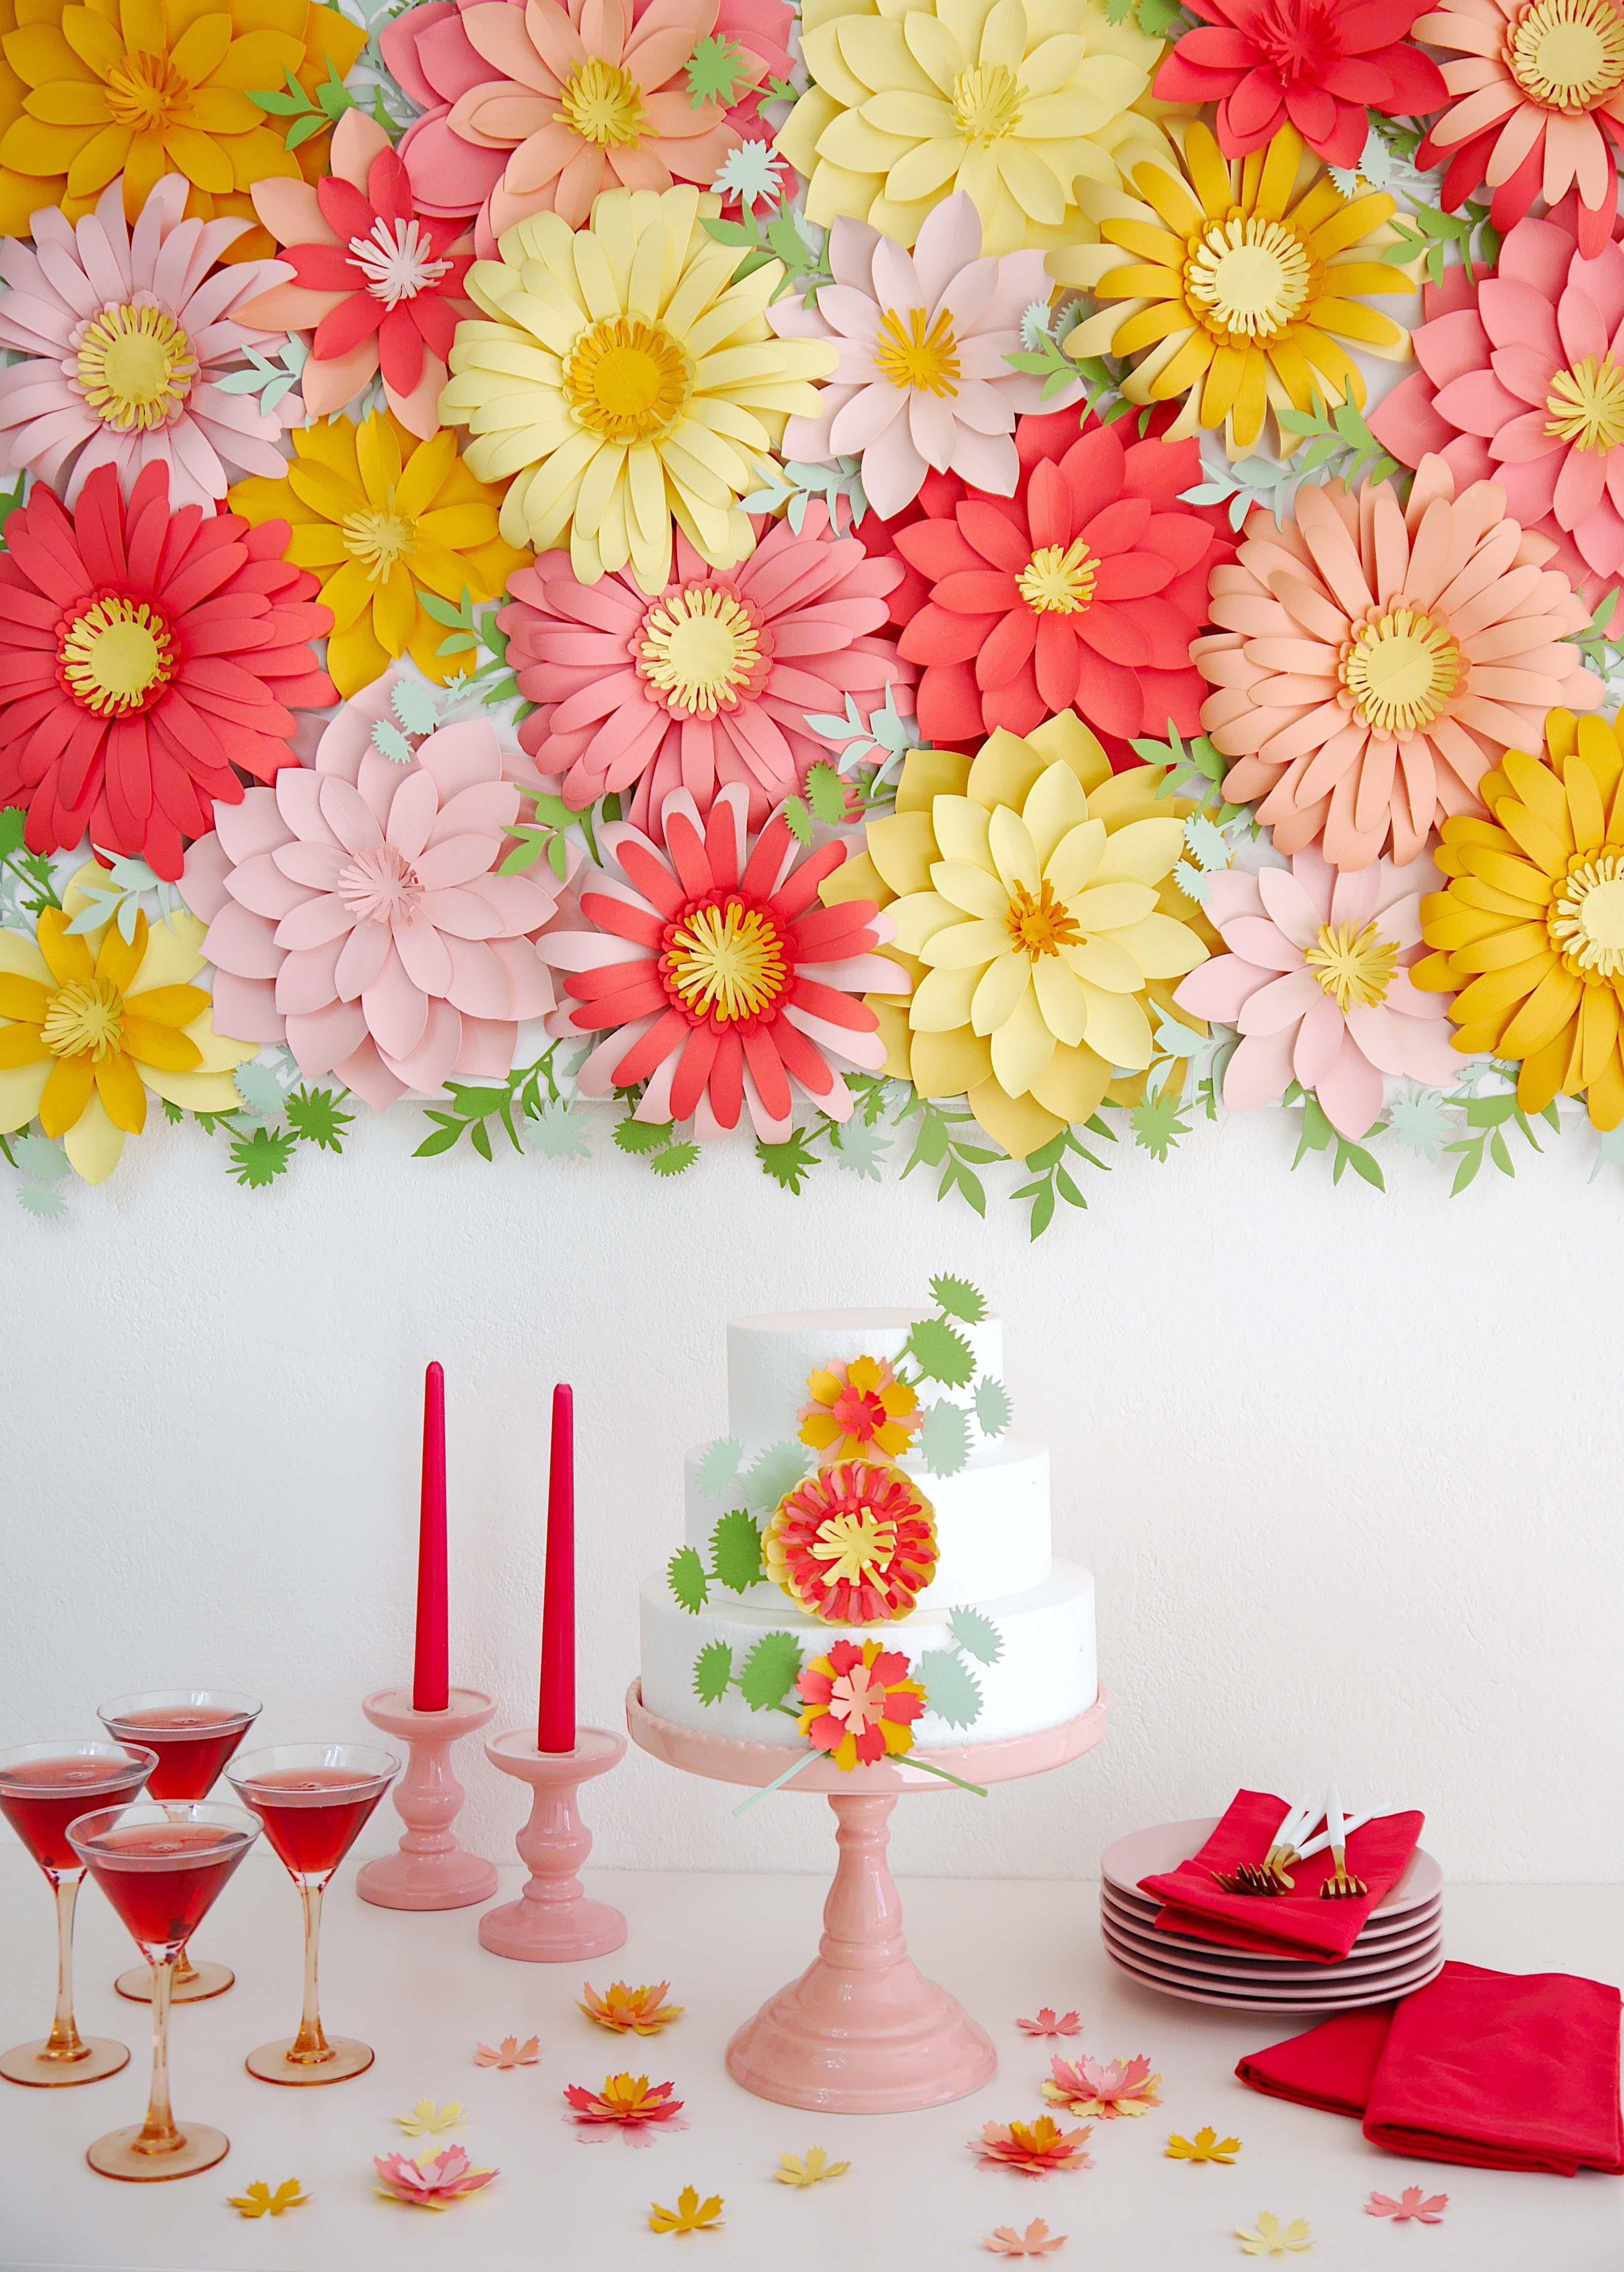 Make This DIY Floral Backdrop!